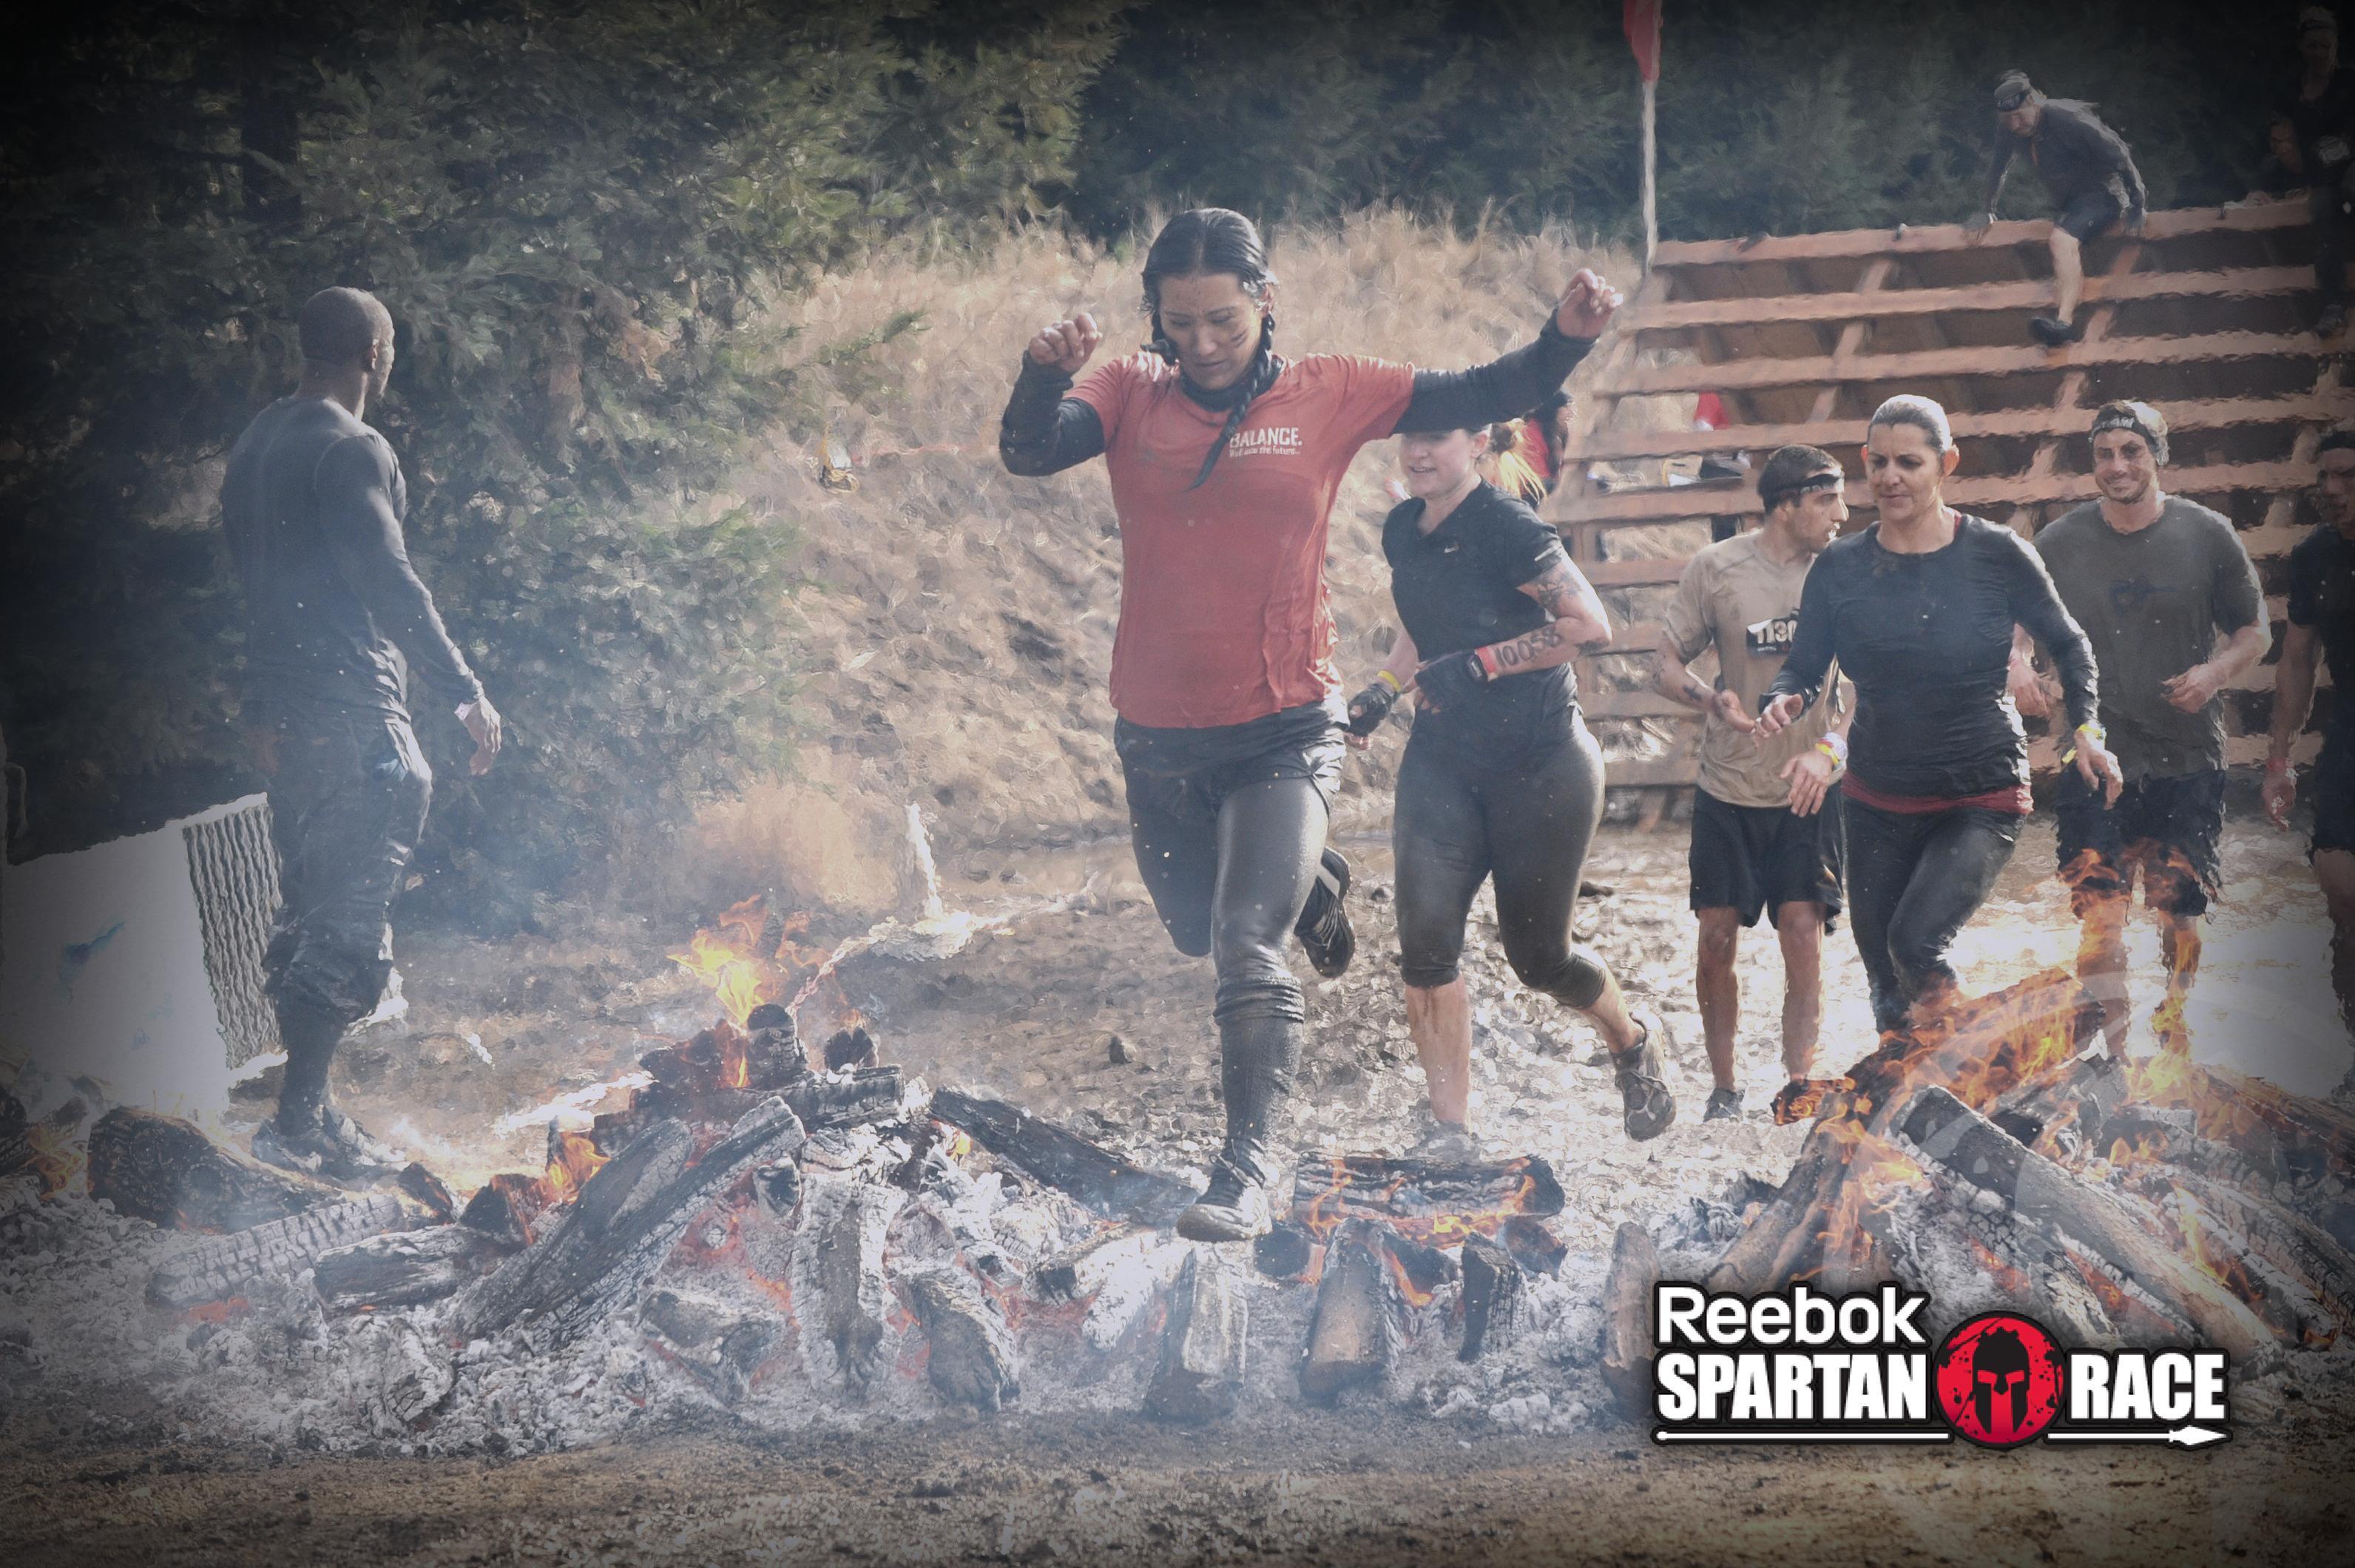 Company Spartan Race